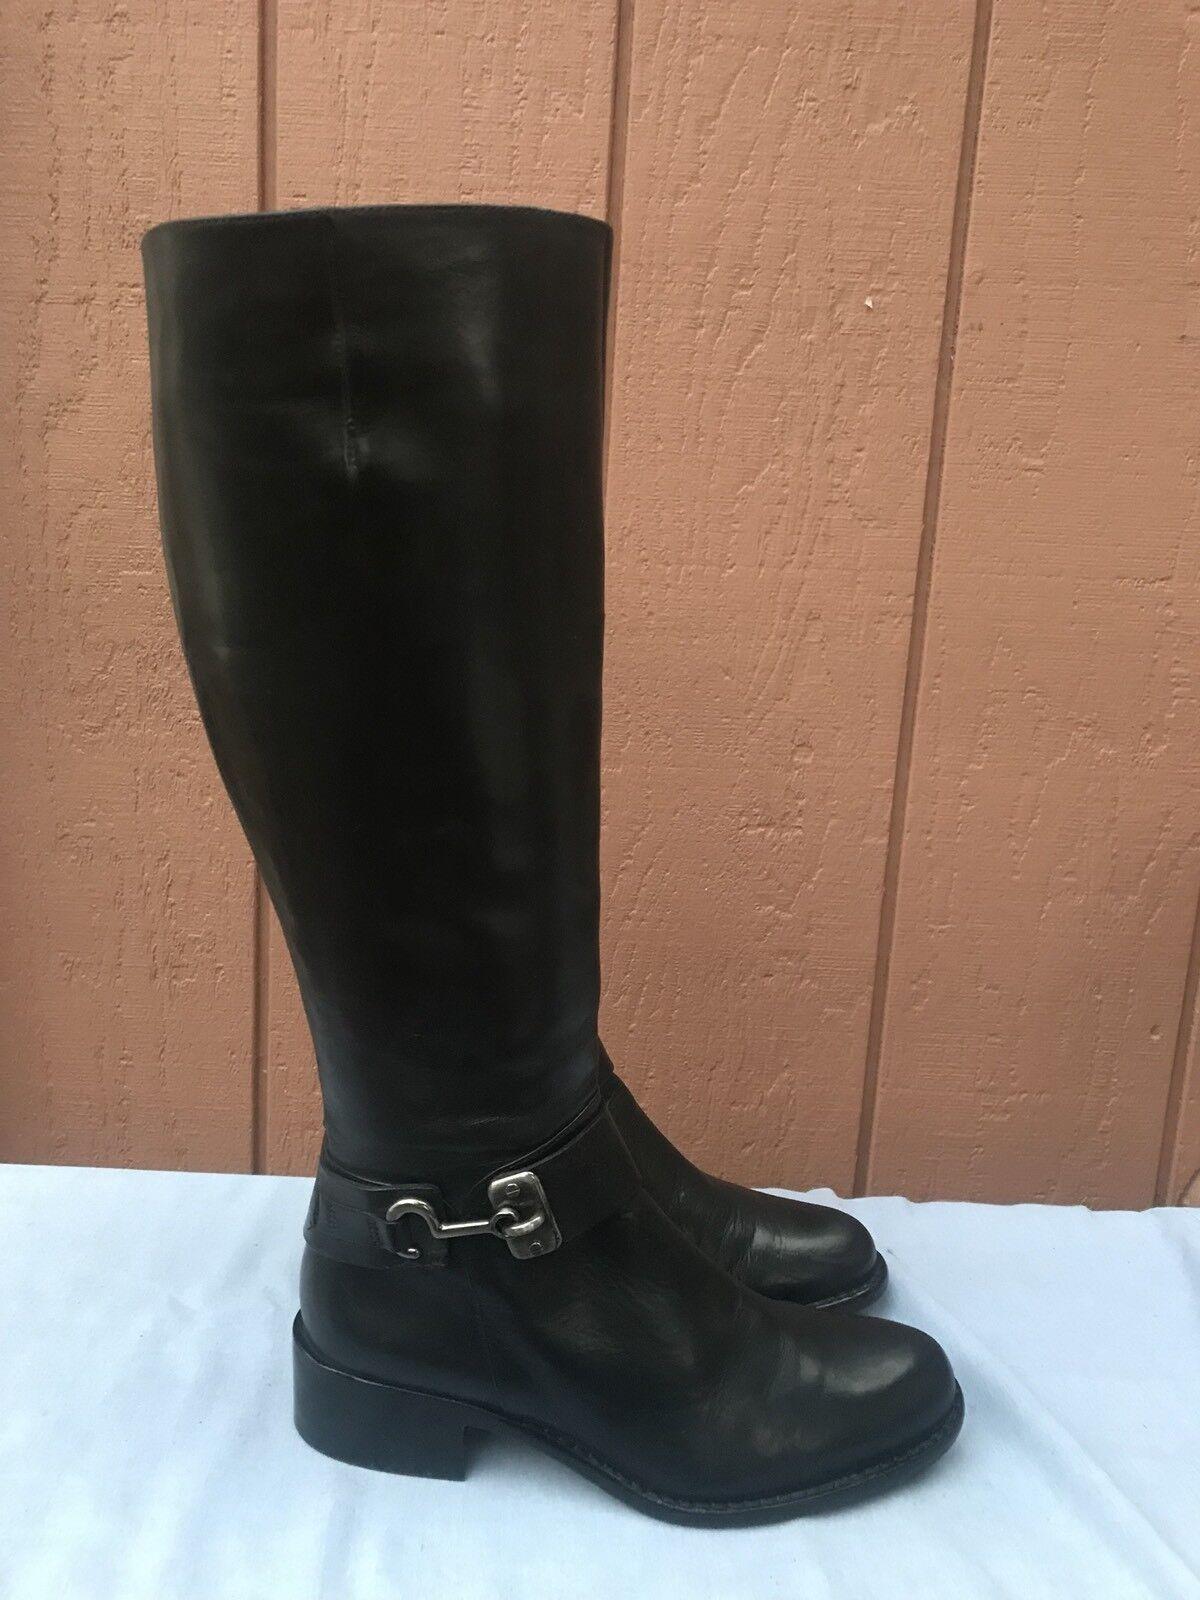 EUC Via Spiga Kali Tall nero Leather Knee High Riding stivali Sz US 5M  398